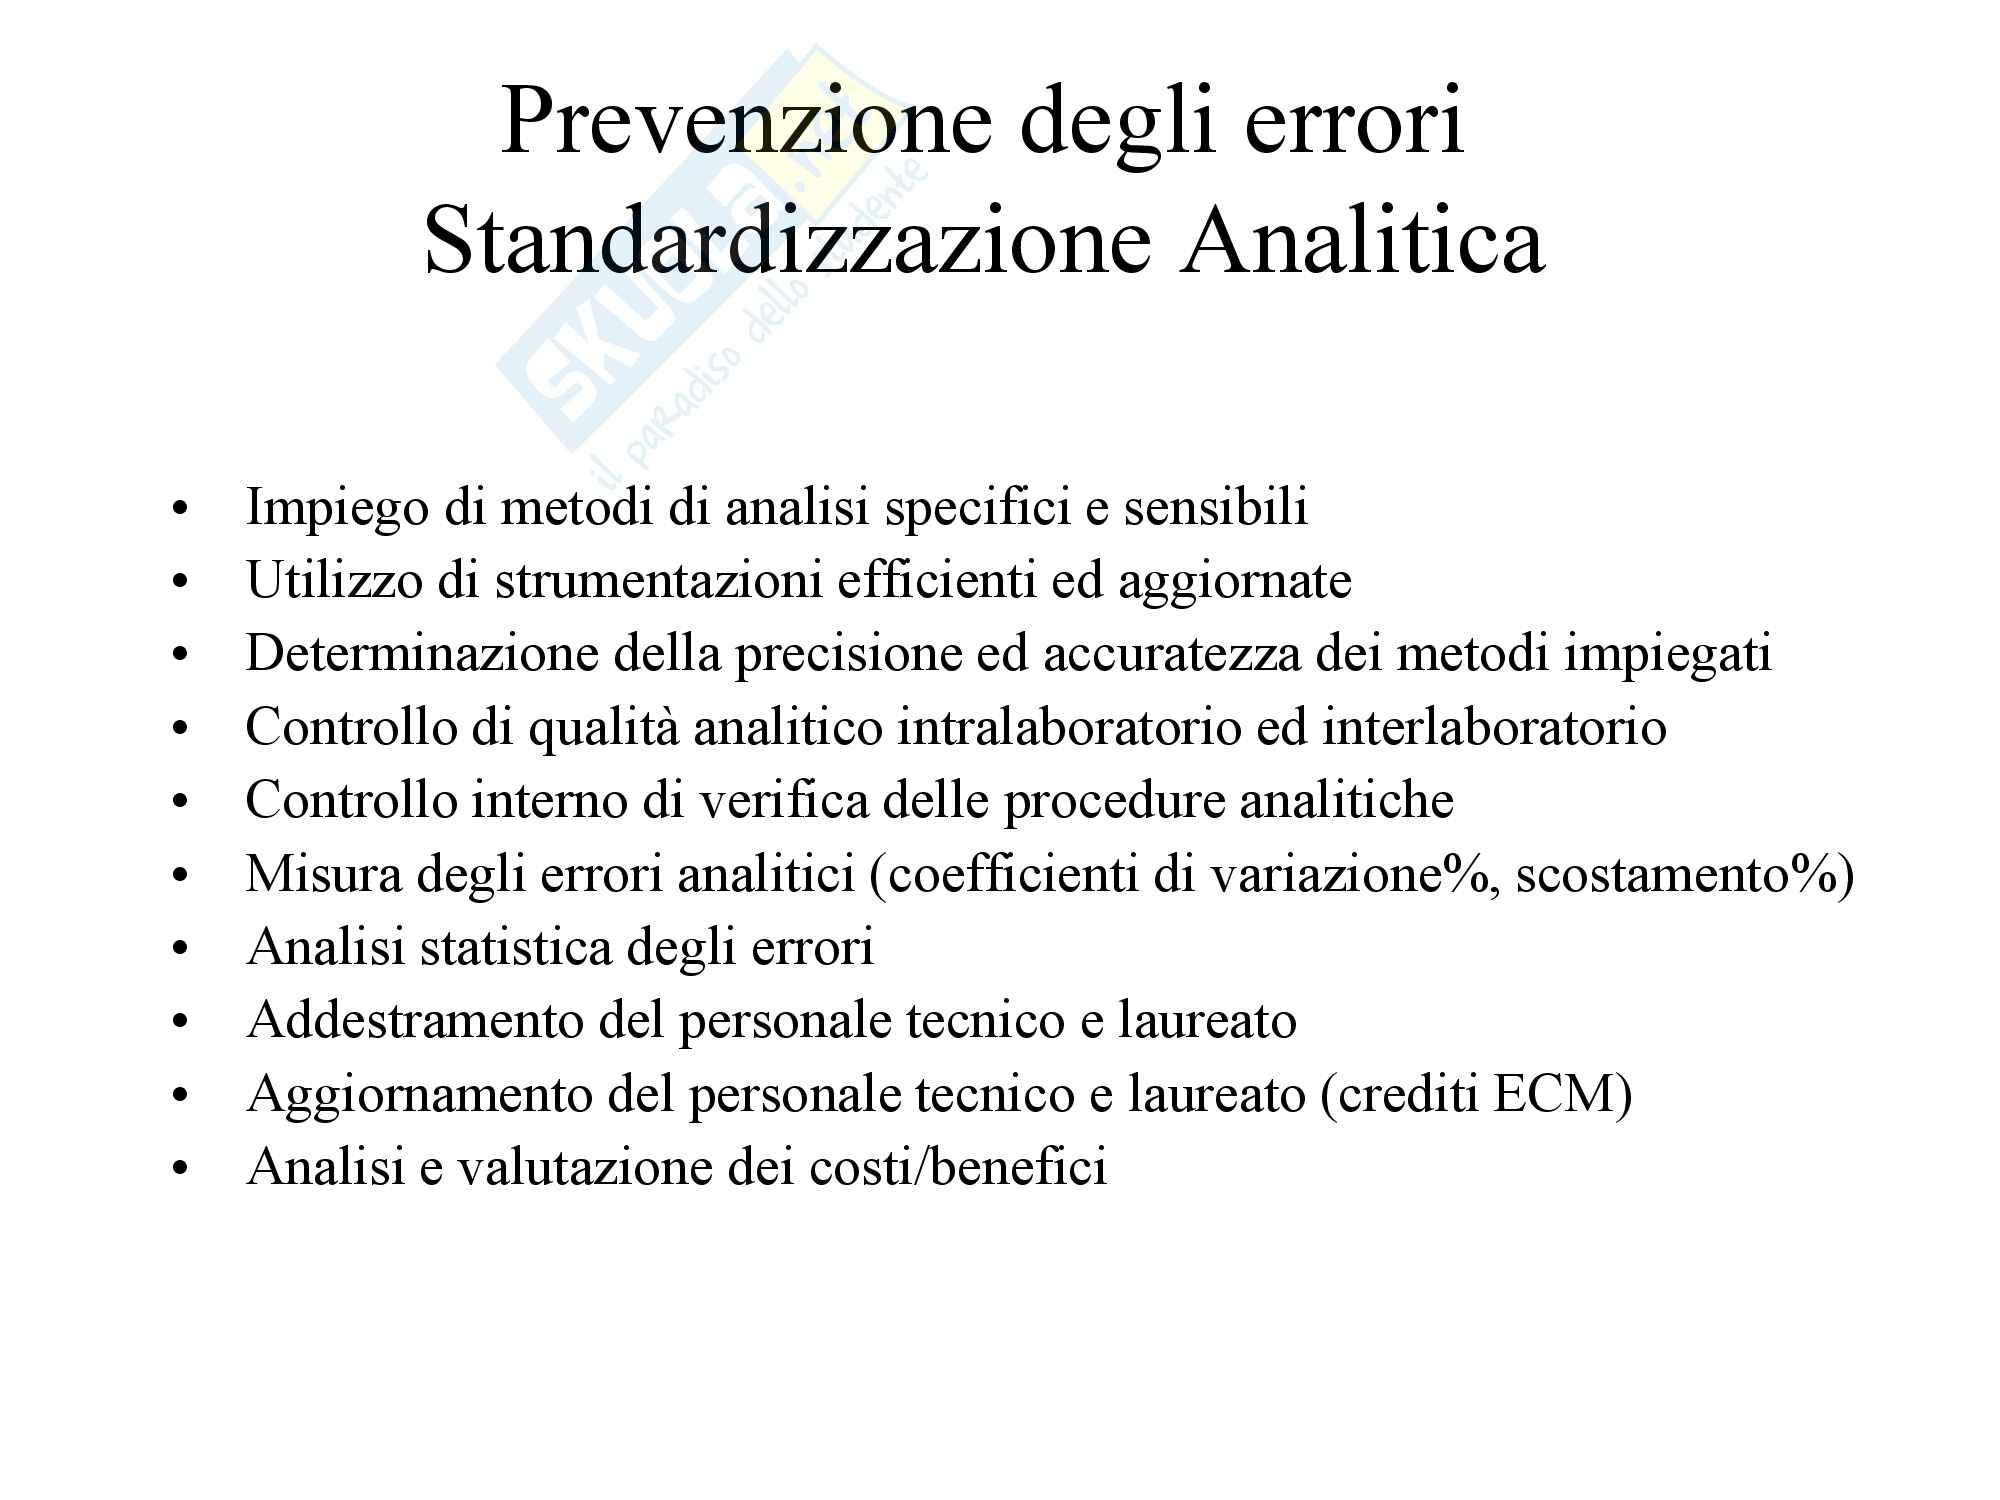 Biochimica Clinica e patologia clinica - Introduzione Pag. 11